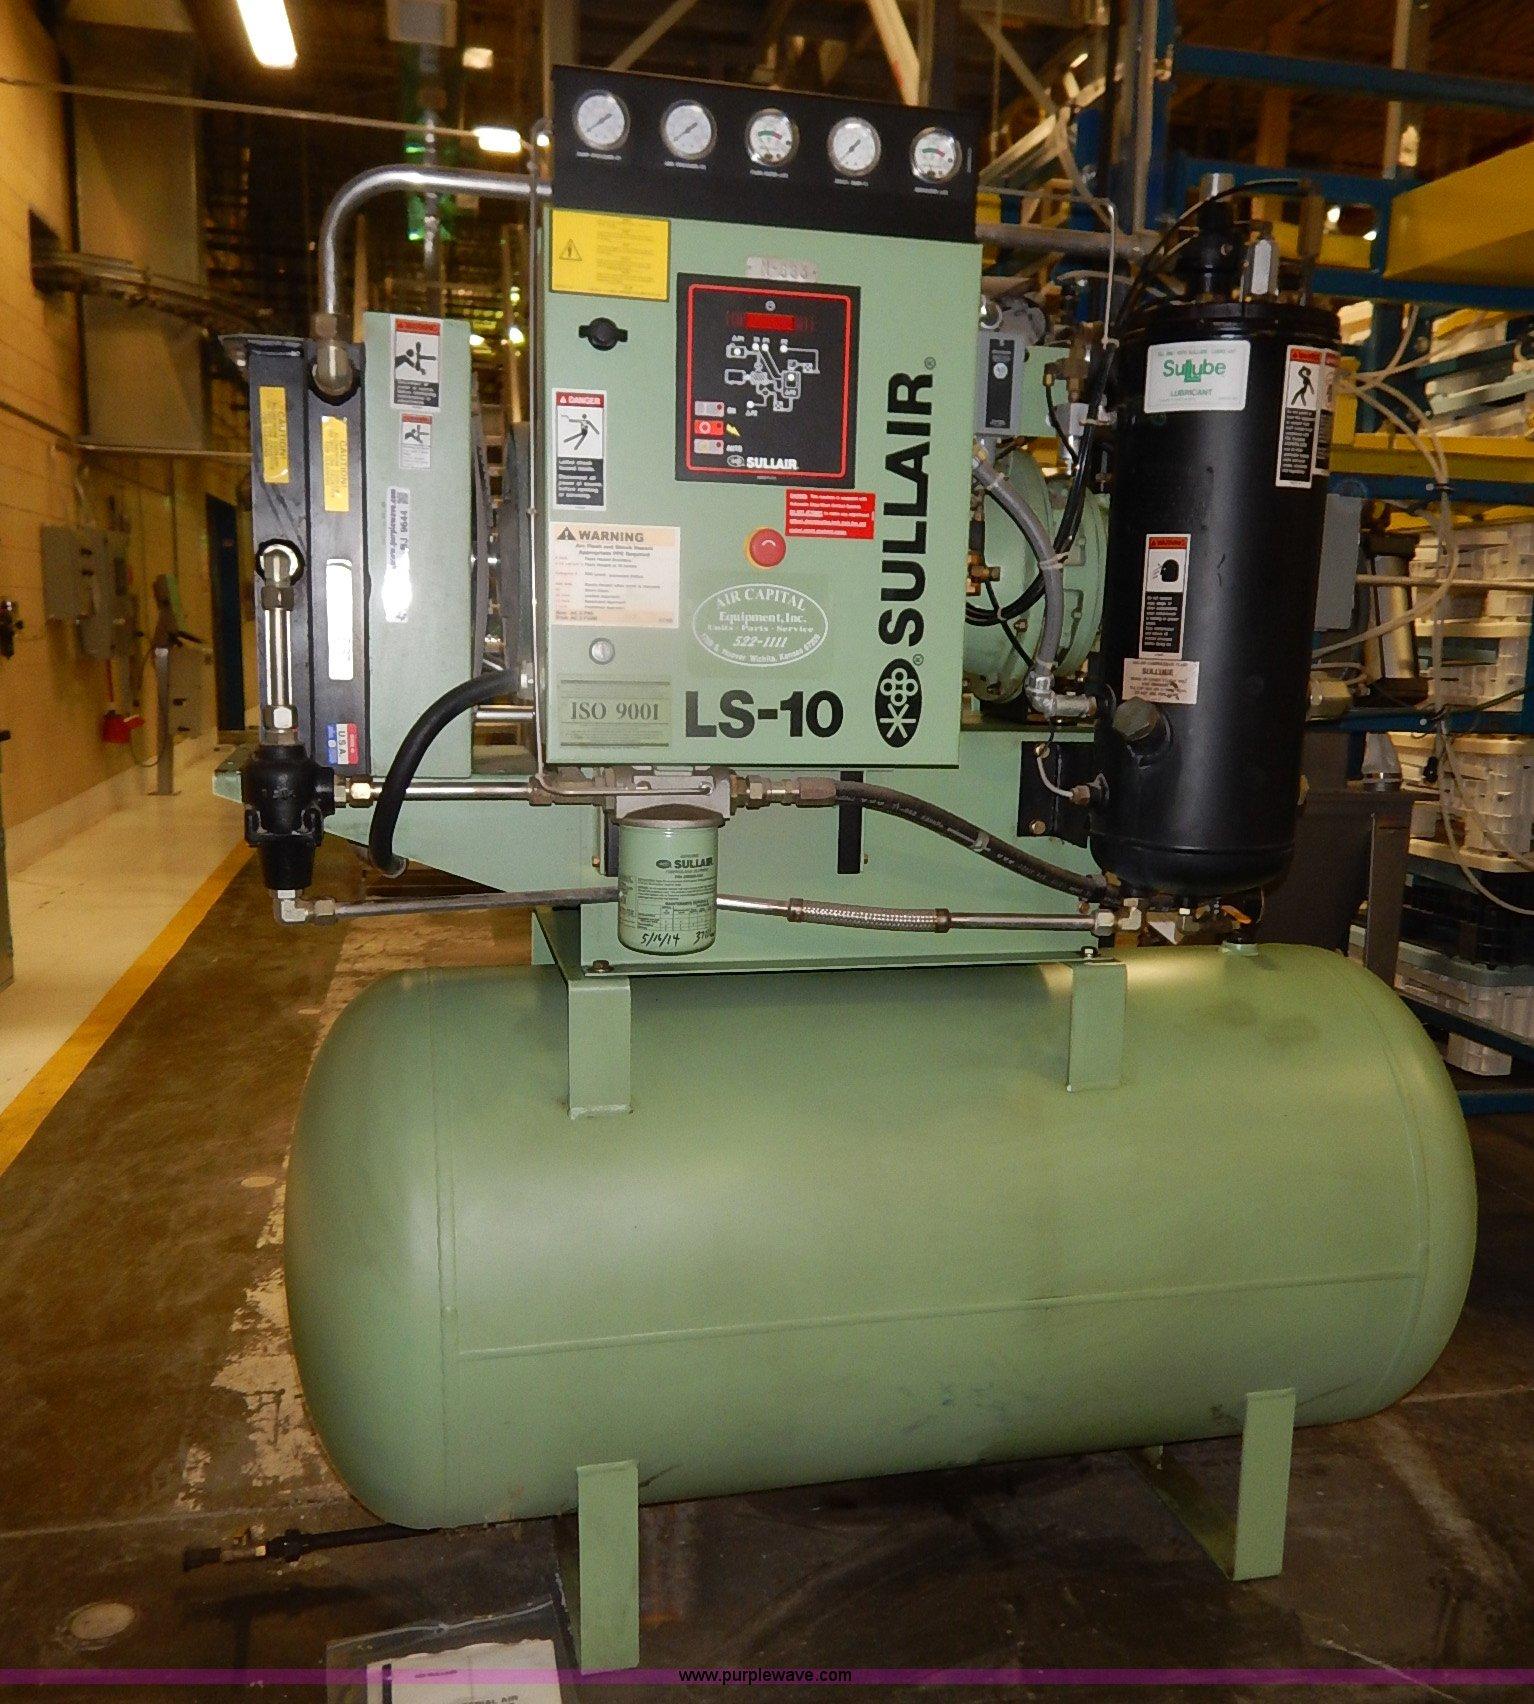 BJ9644 image for item BJ9644 2002 Sullair rotary air compressor